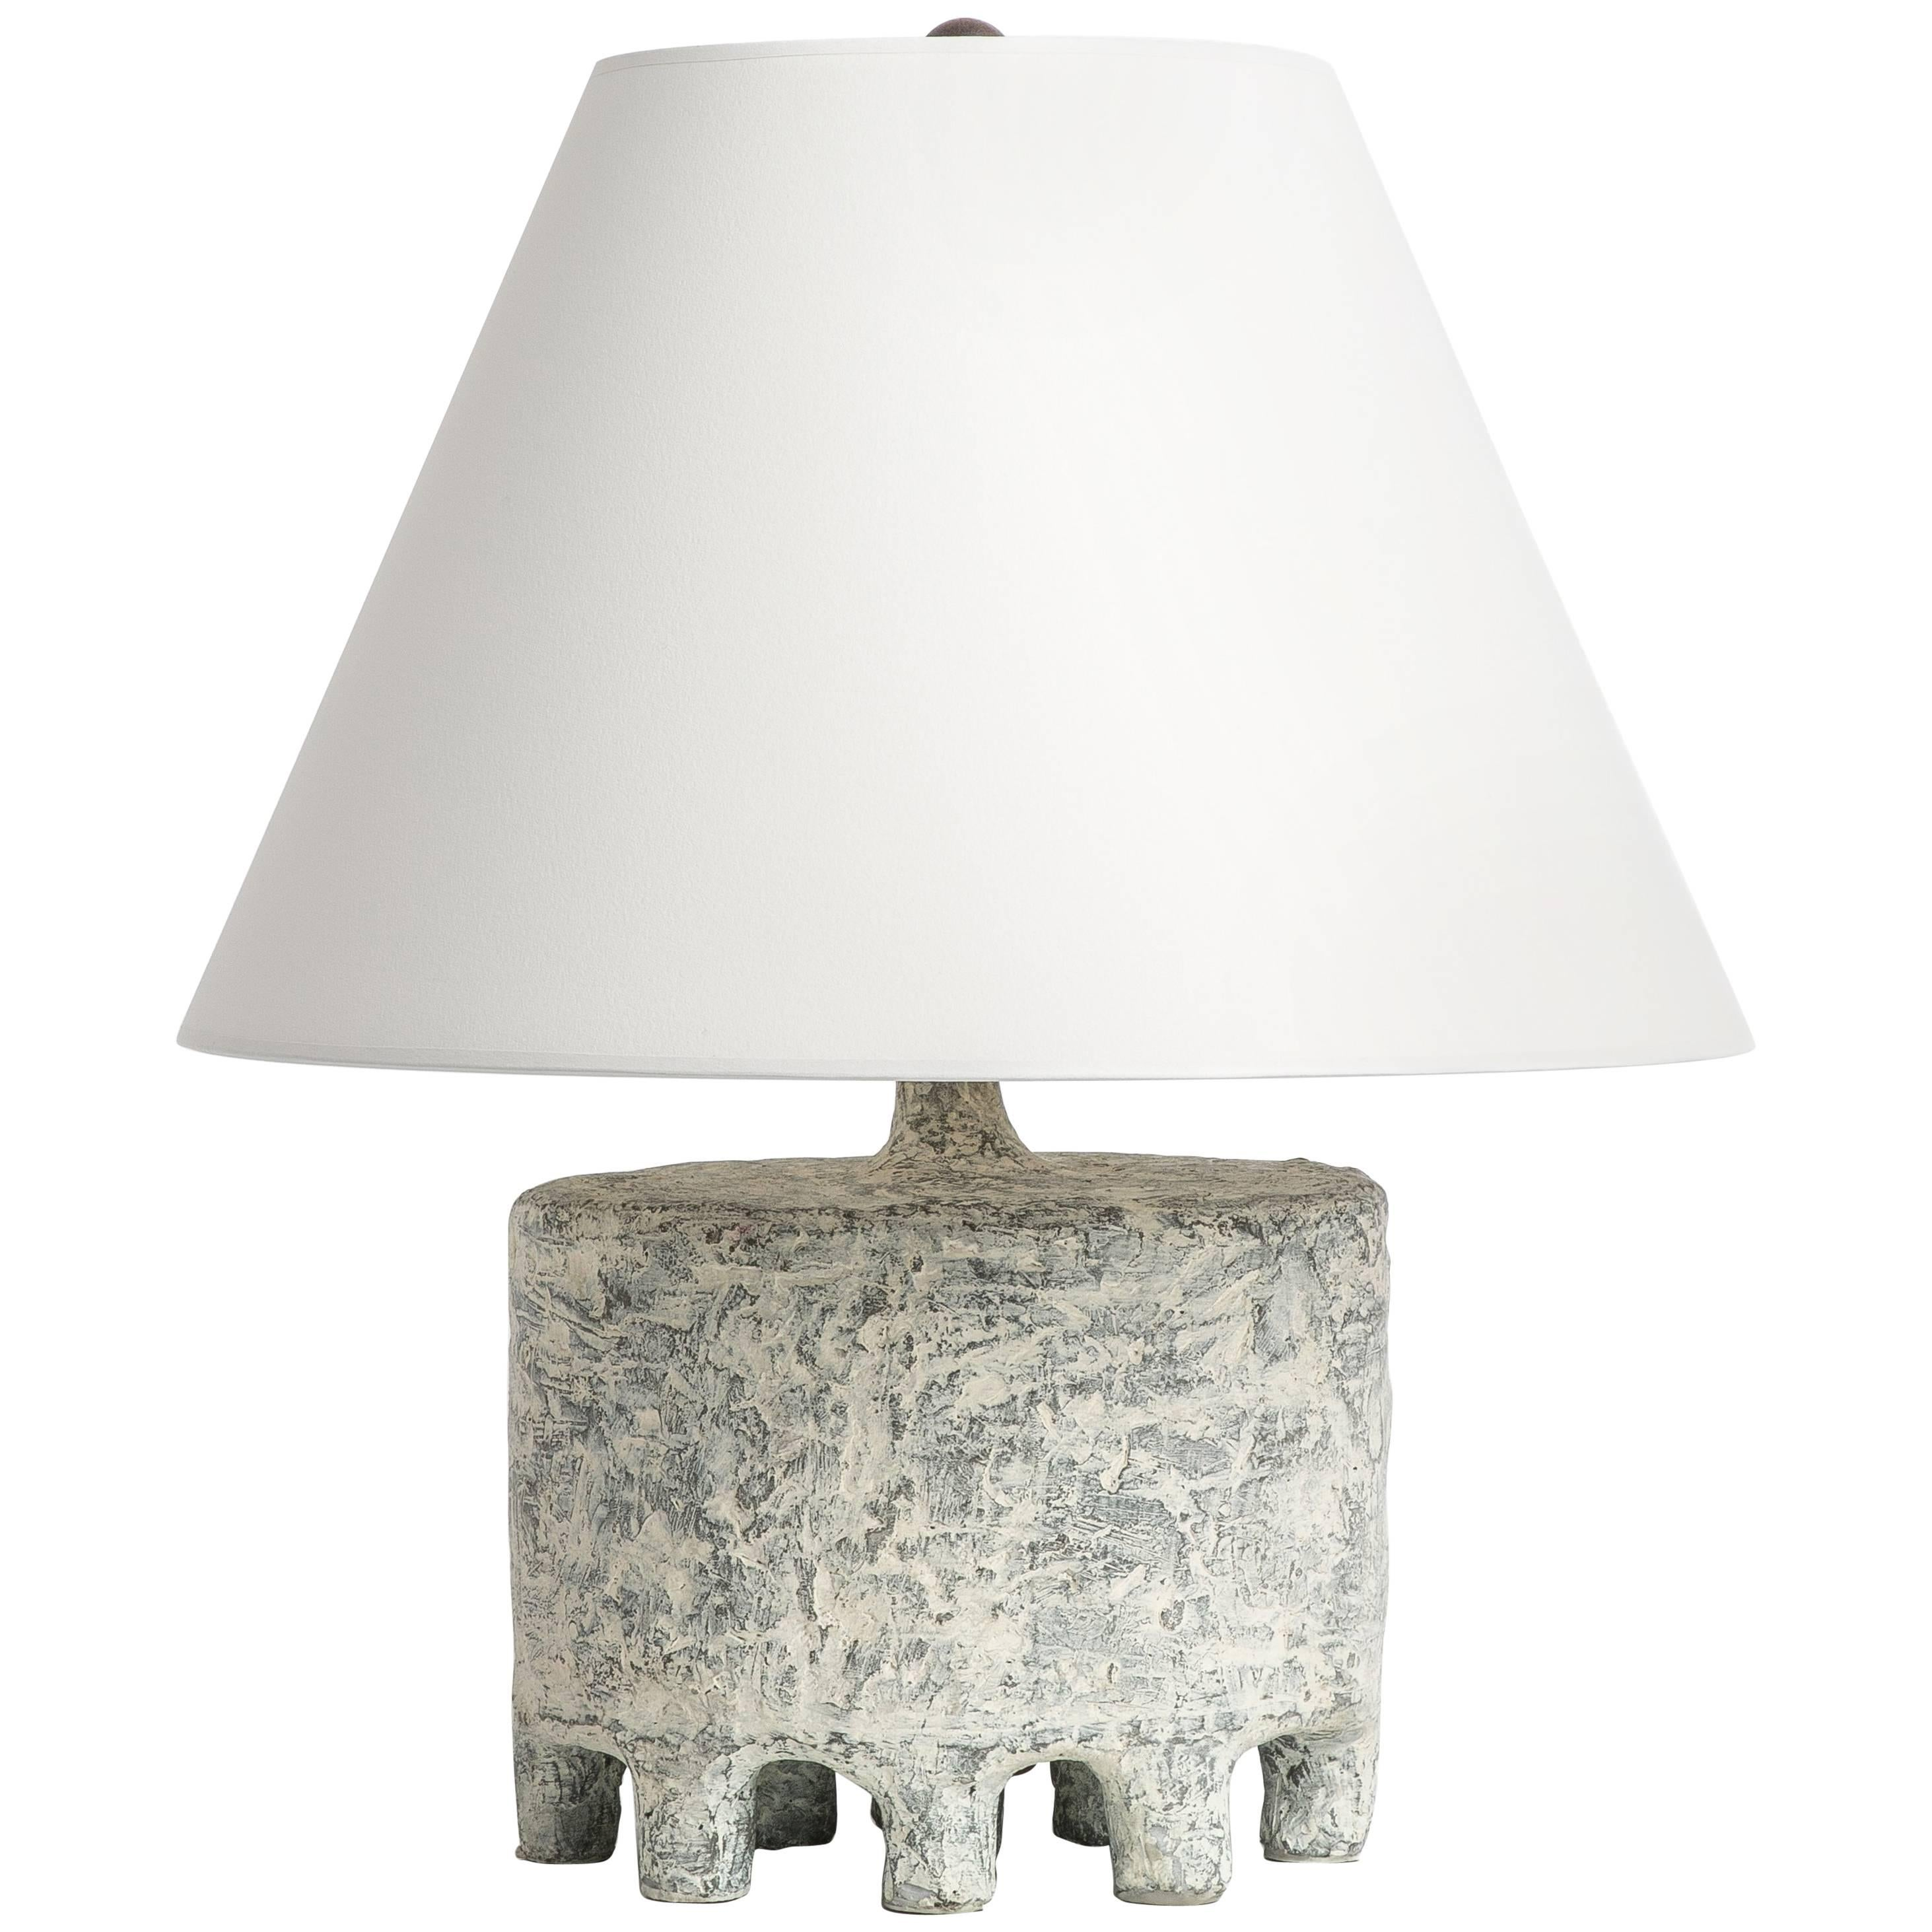 Cast Resin Plaster Texture Kubus Table Lamp, Kacper Dolatowski